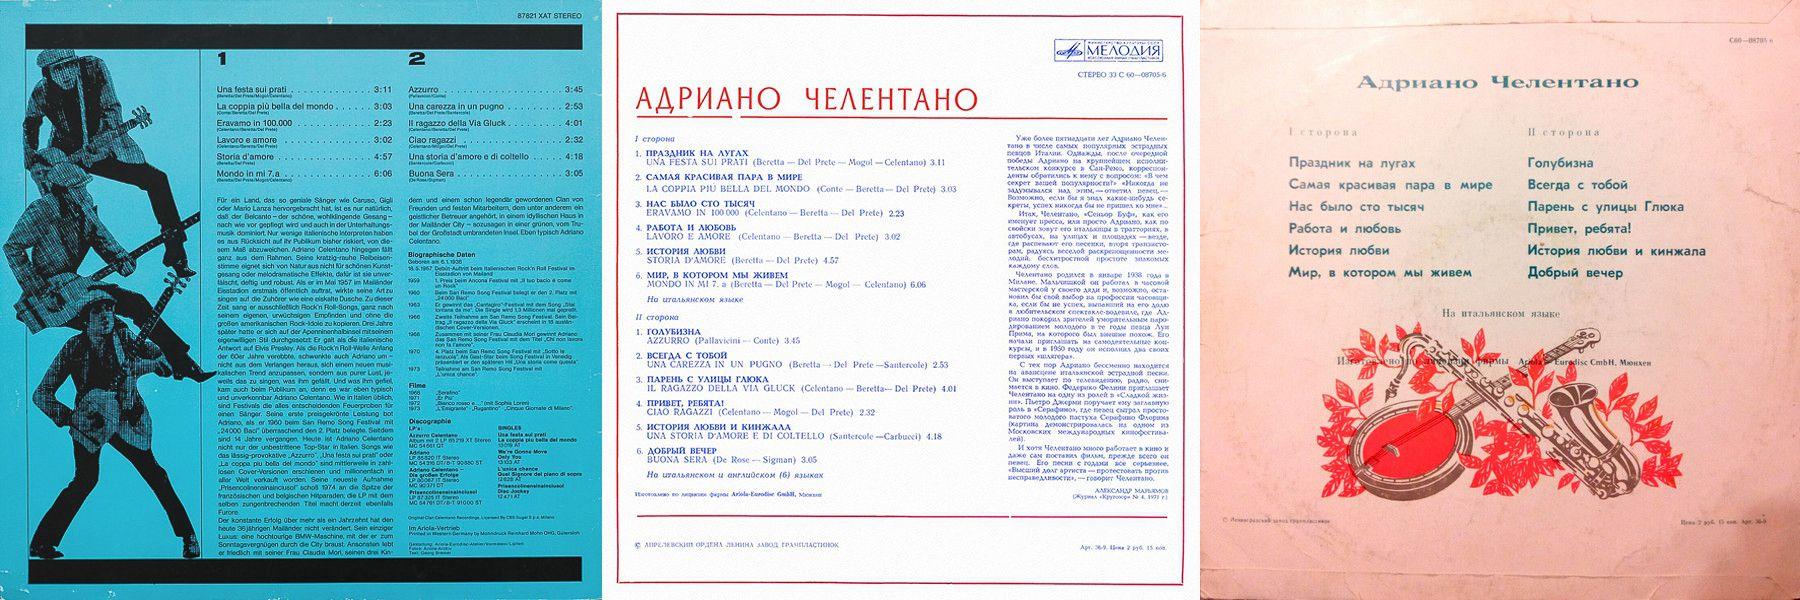 Adriano Celentano – Una Festa Sui Prati Адриано Челентано 2.jpg